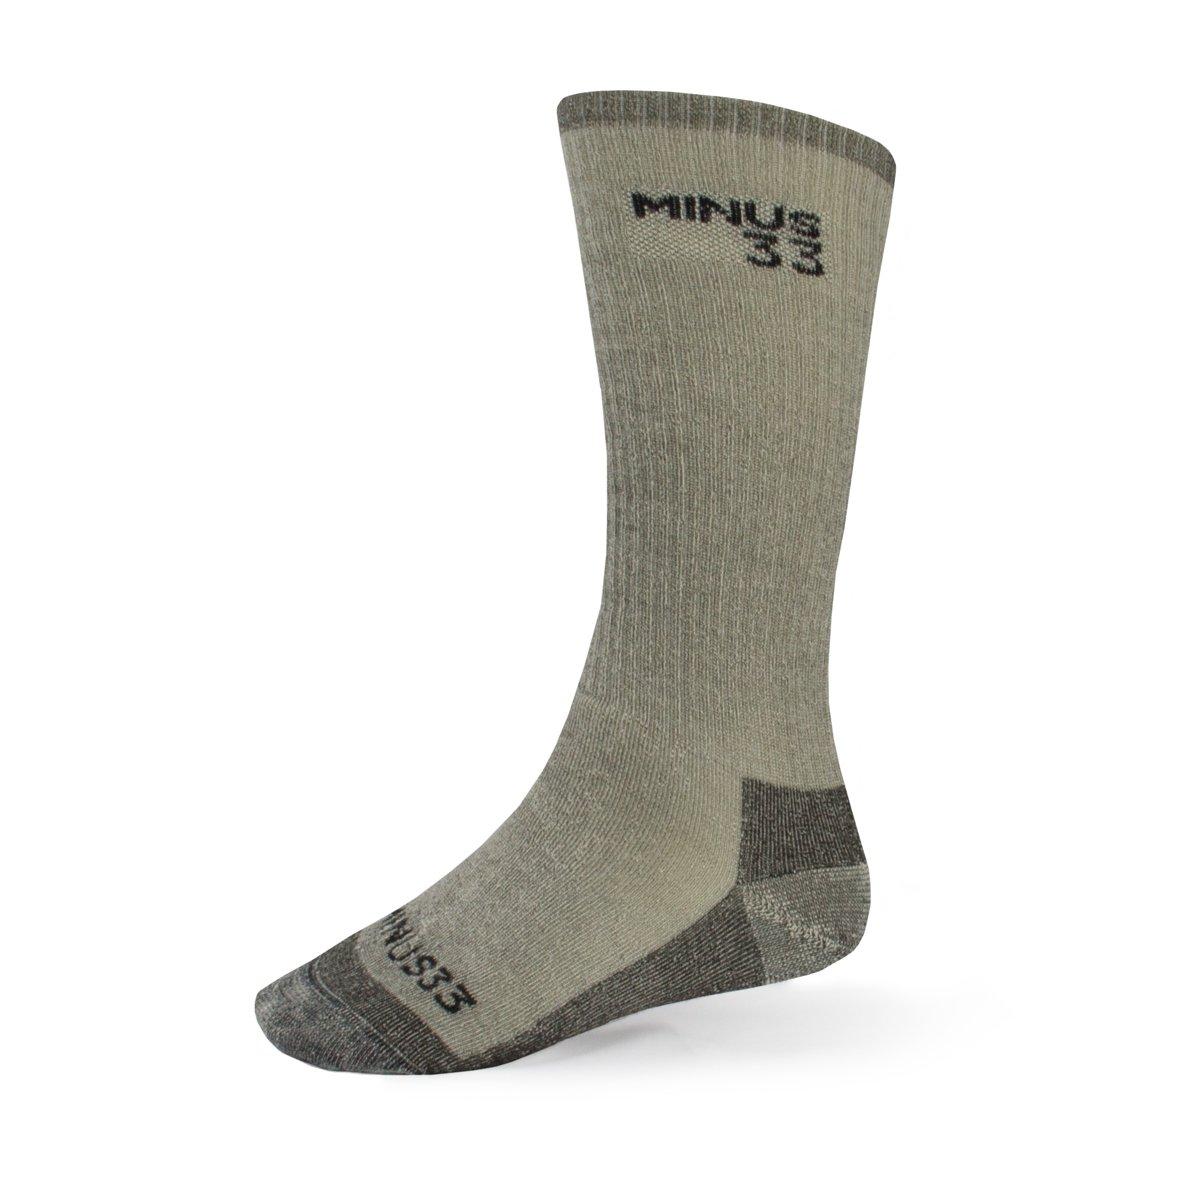 Minus33 Merino Wool Expedition Mountaineer Sock, Grey Heather, Small by Minus33 Merino Wool